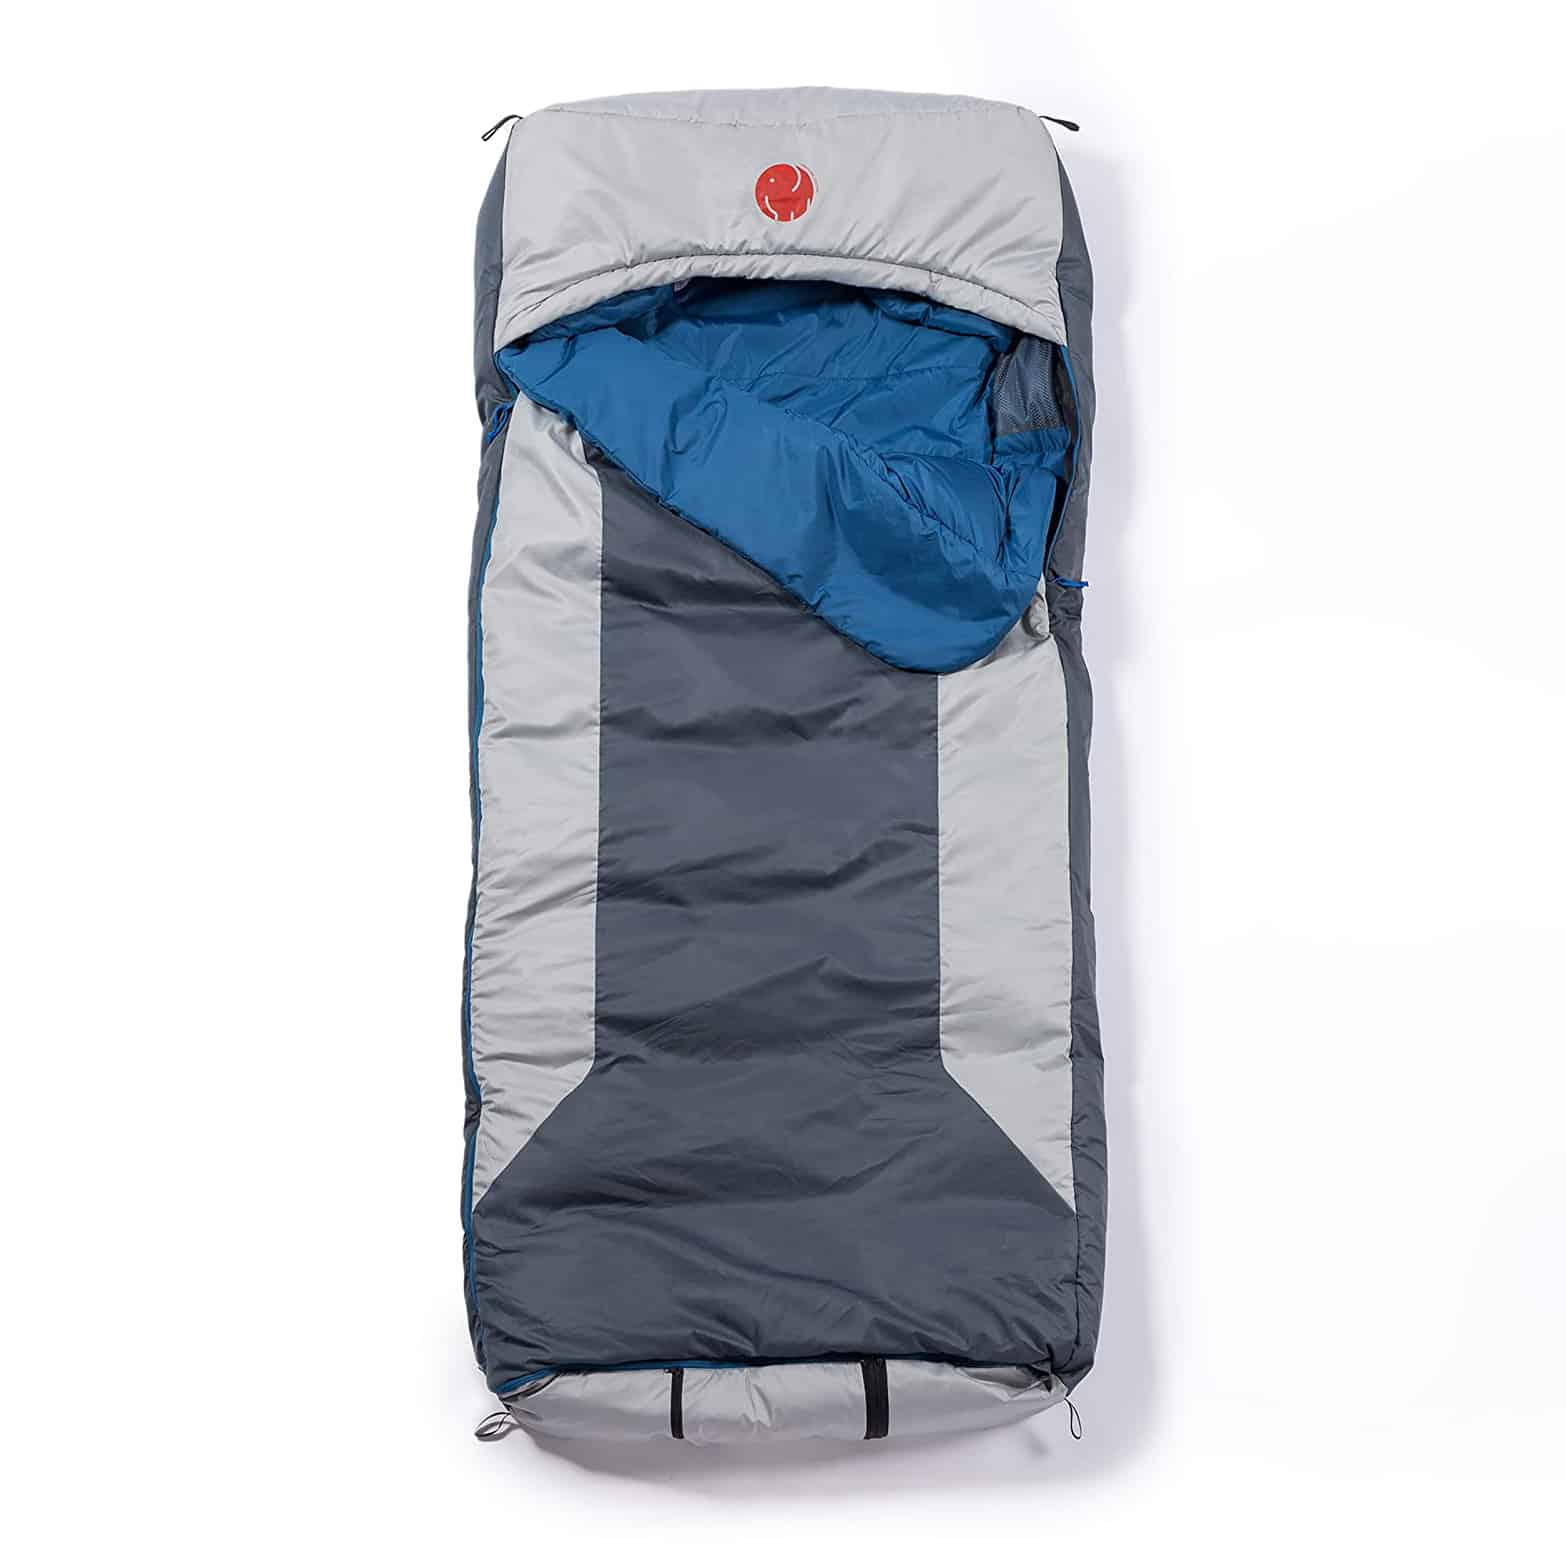 OmniCore Designs Multi Down Hooded Rectangular Sleeping Bag